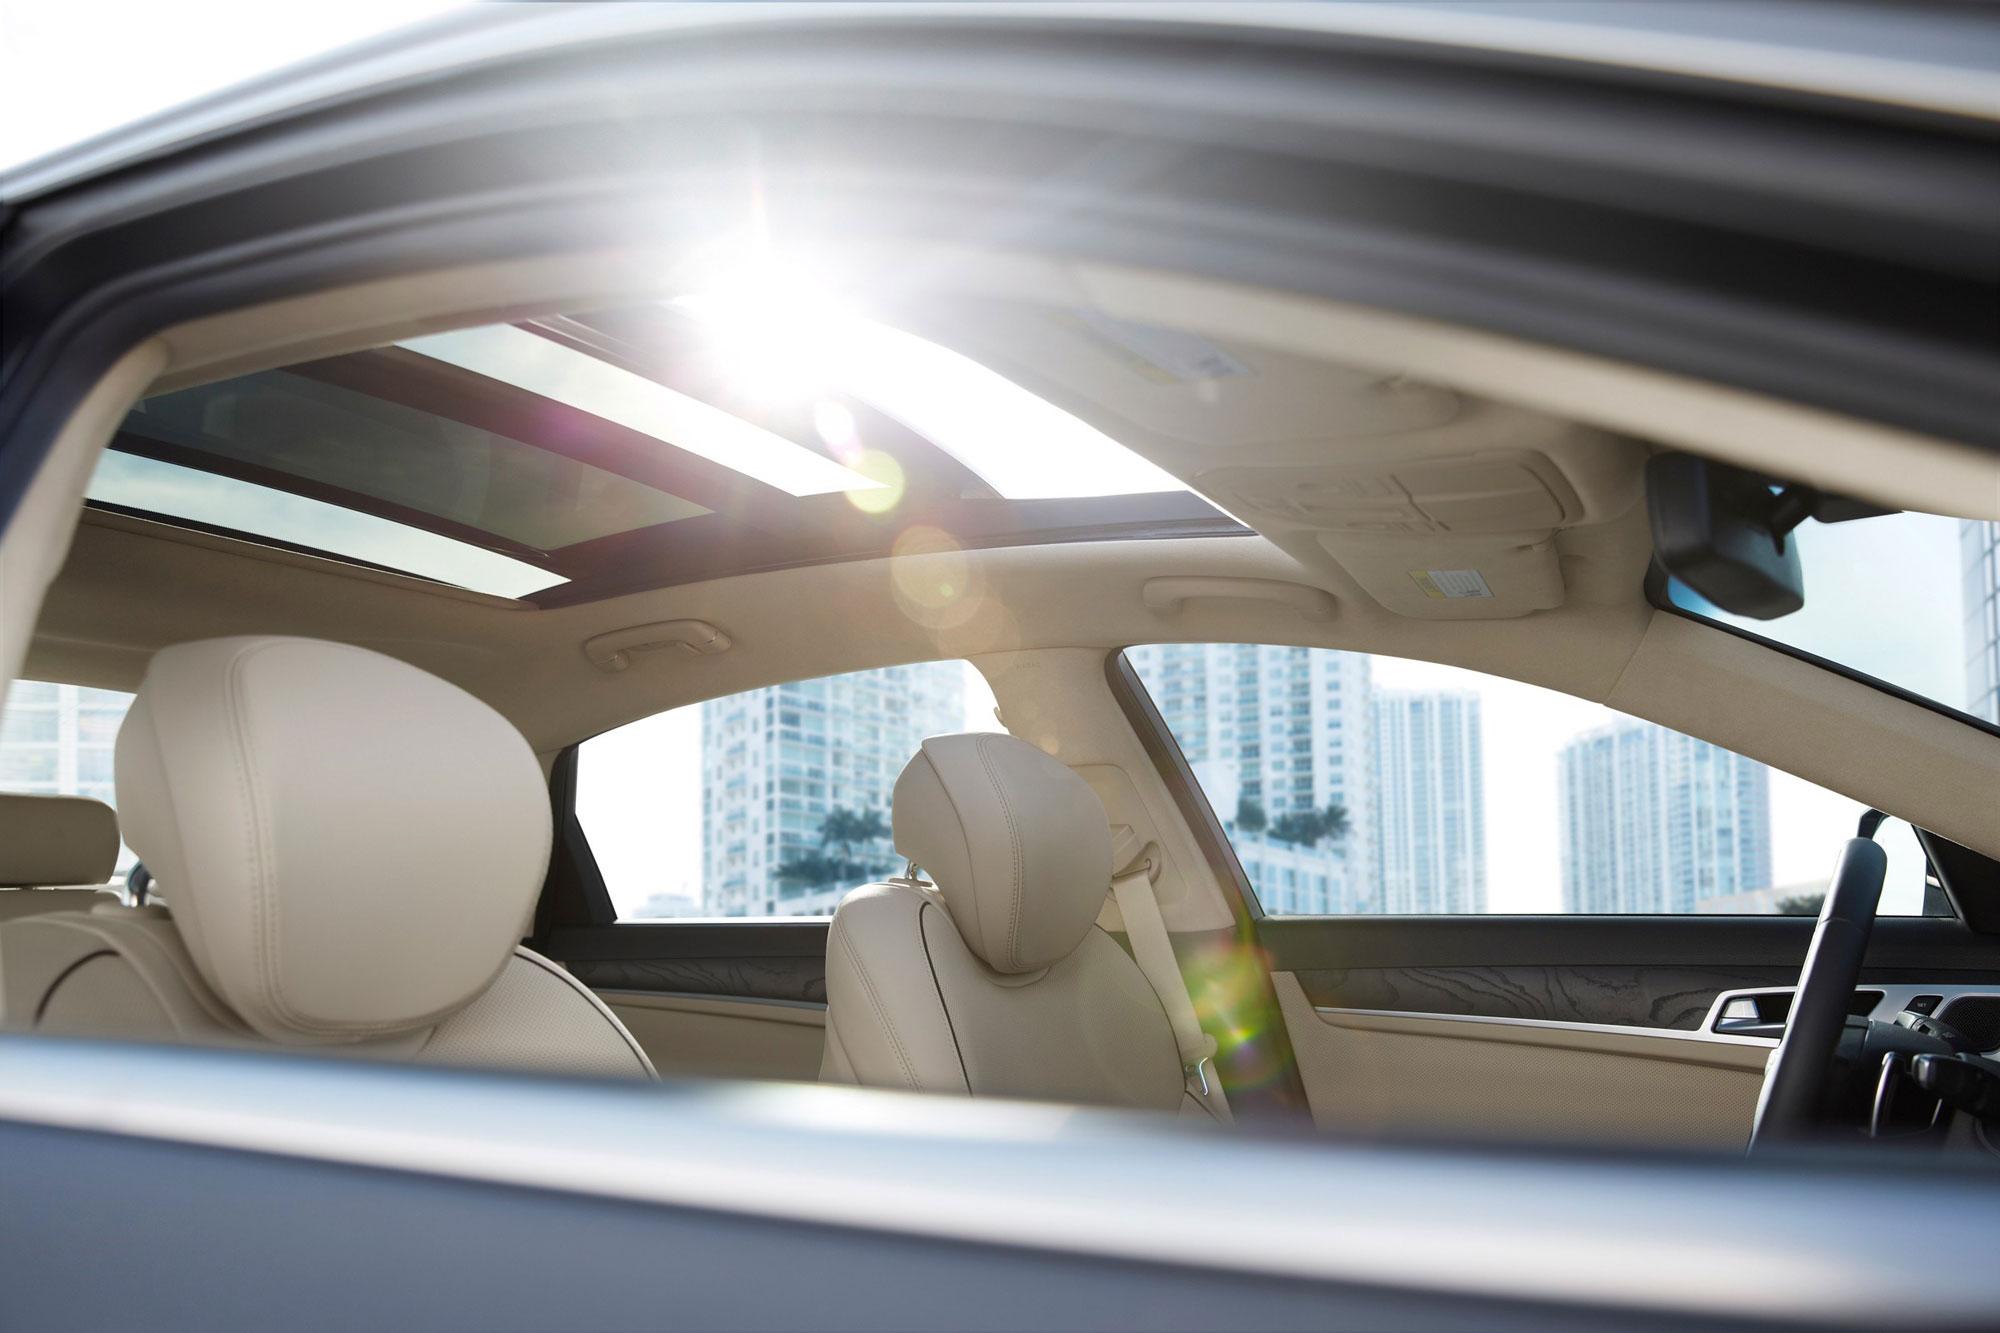 The technology inside the 2016 Hyundai Genesis